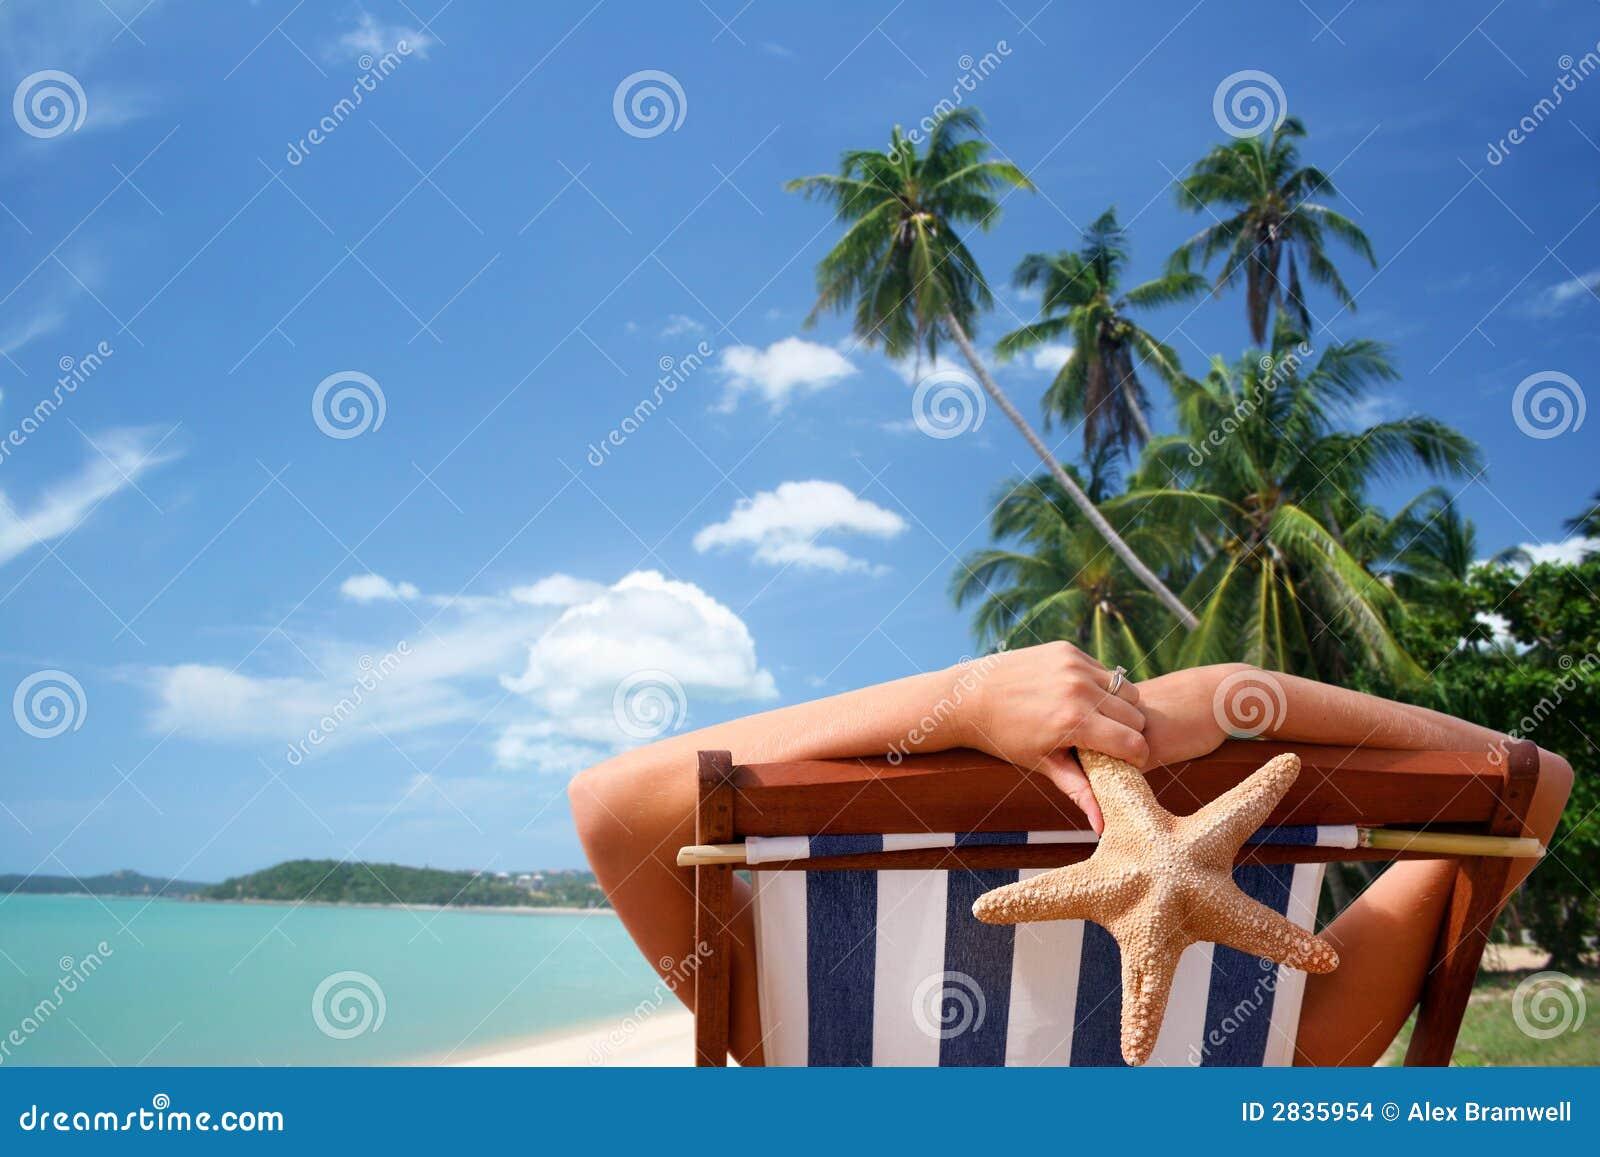 Sunbather tropical